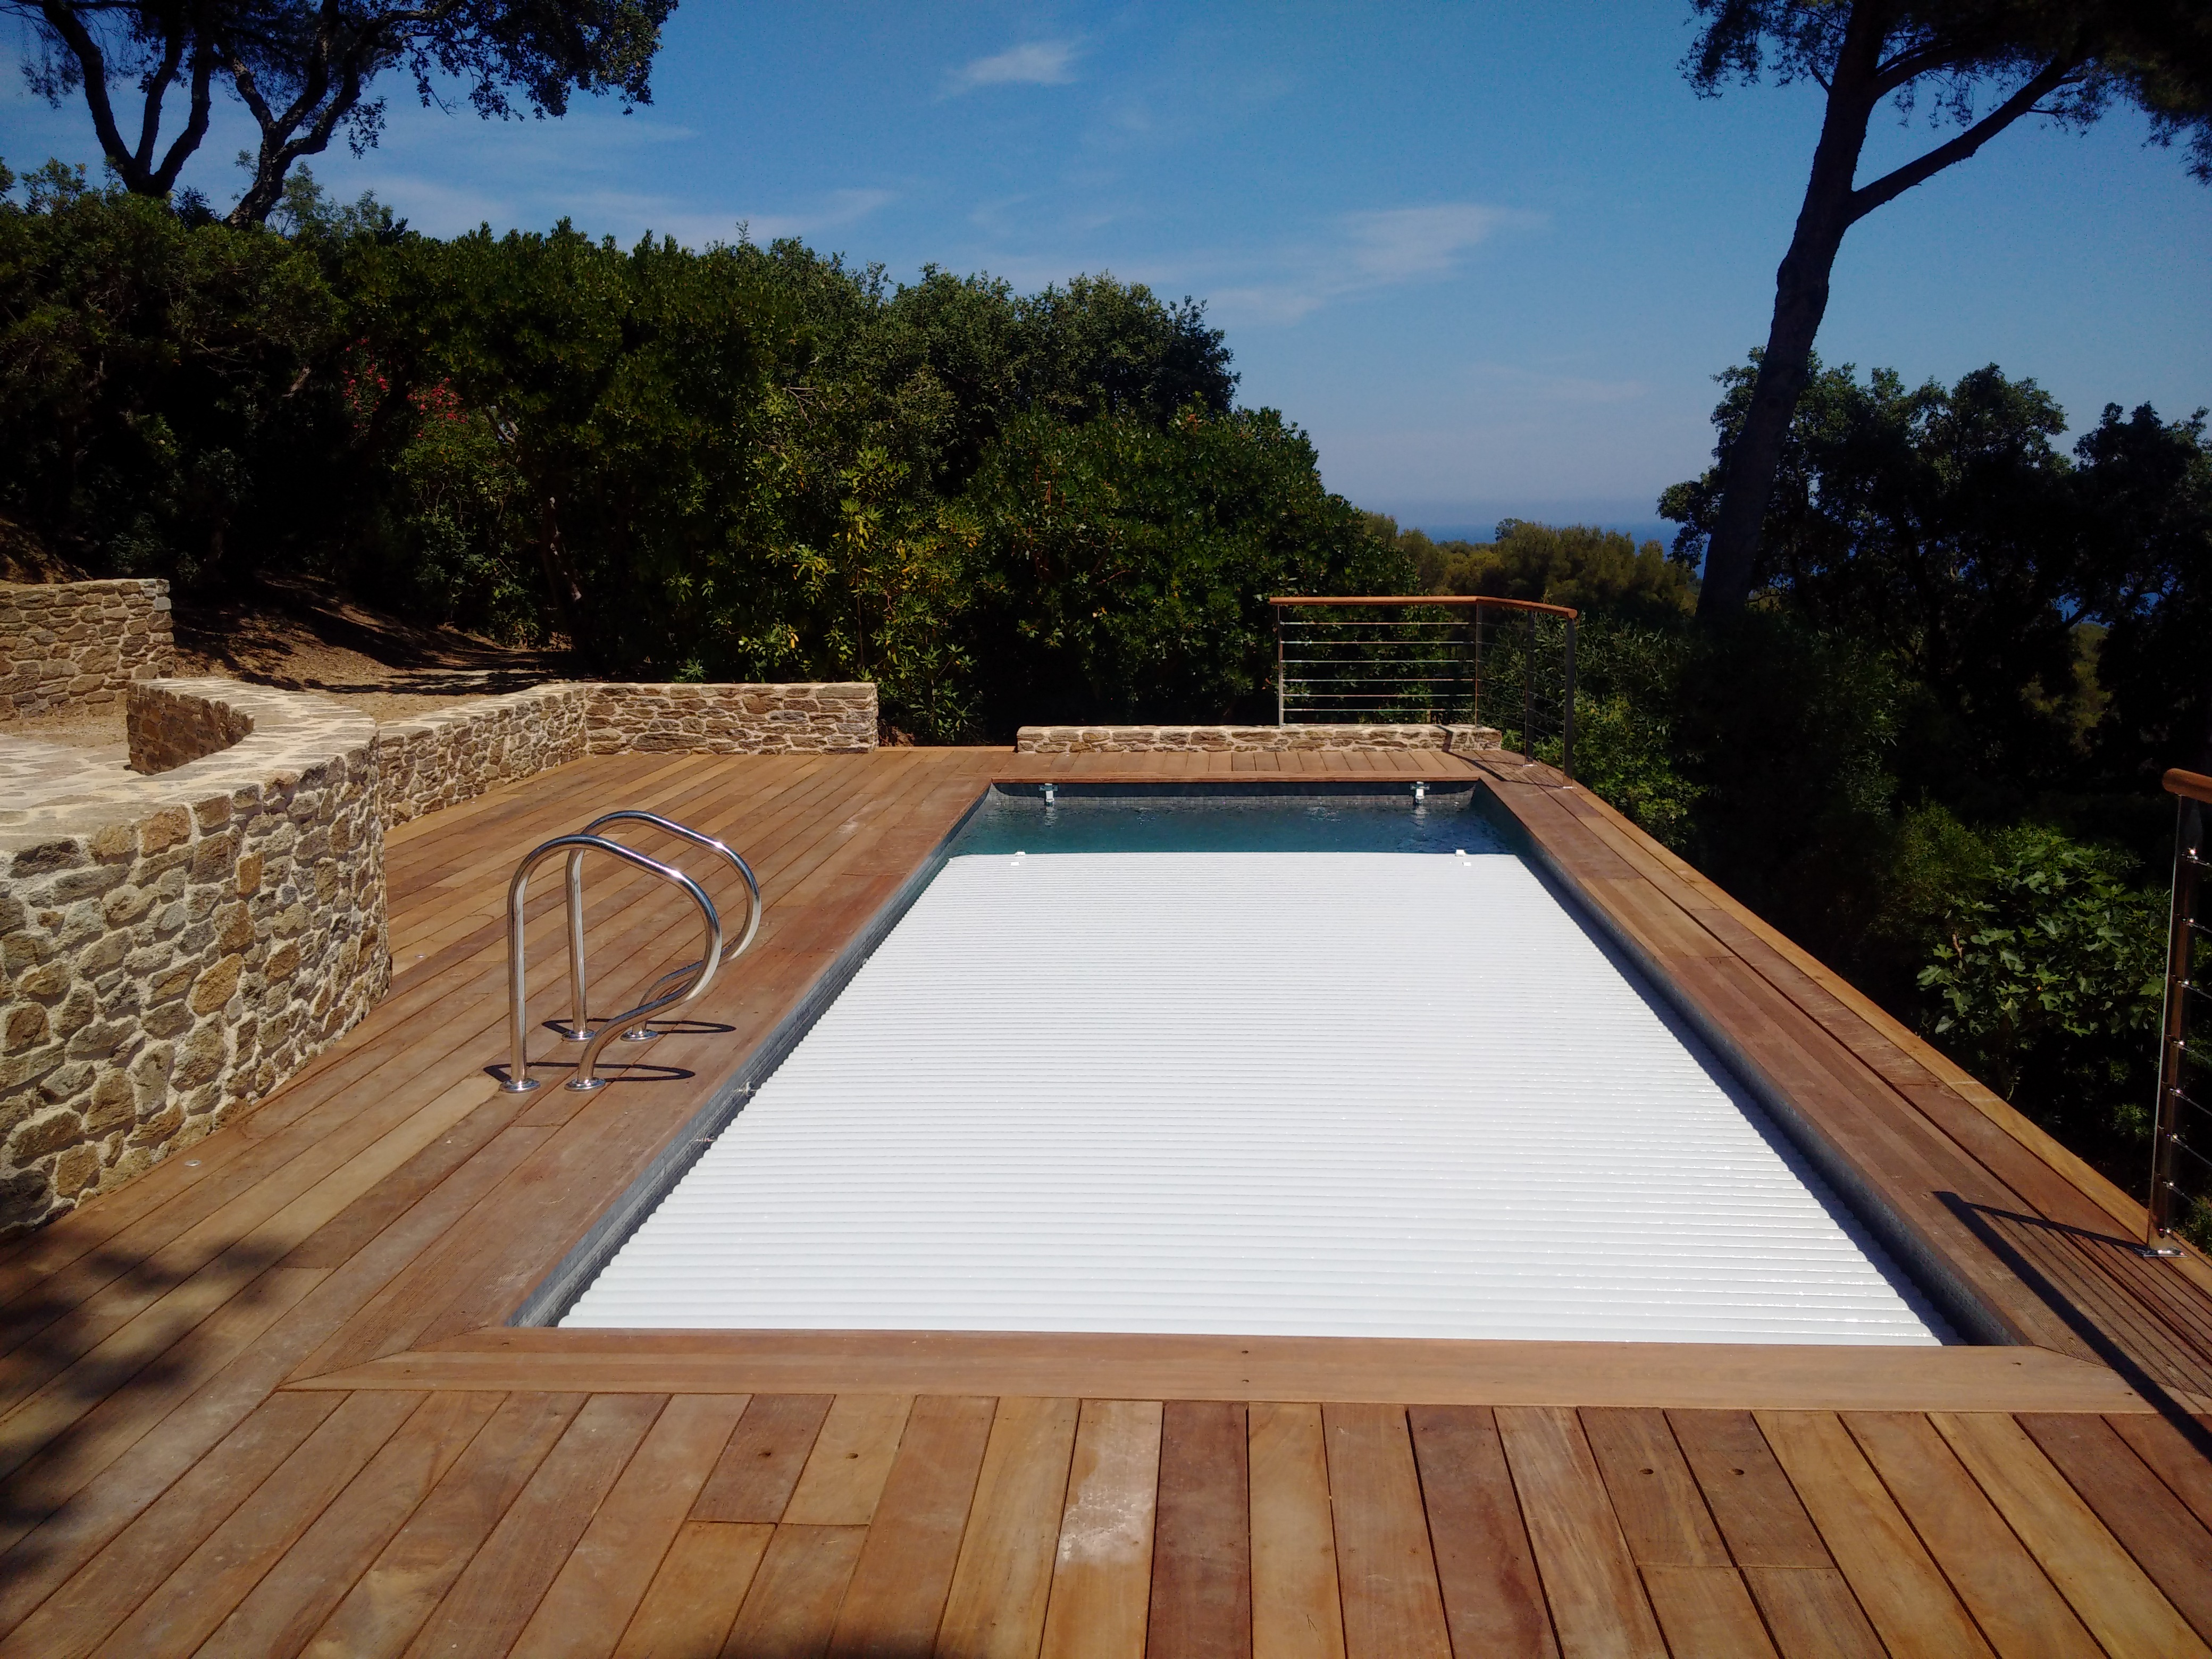 La piscine aquaset brignoles var draguignan fr jus - Plage piscine sans margelle ...